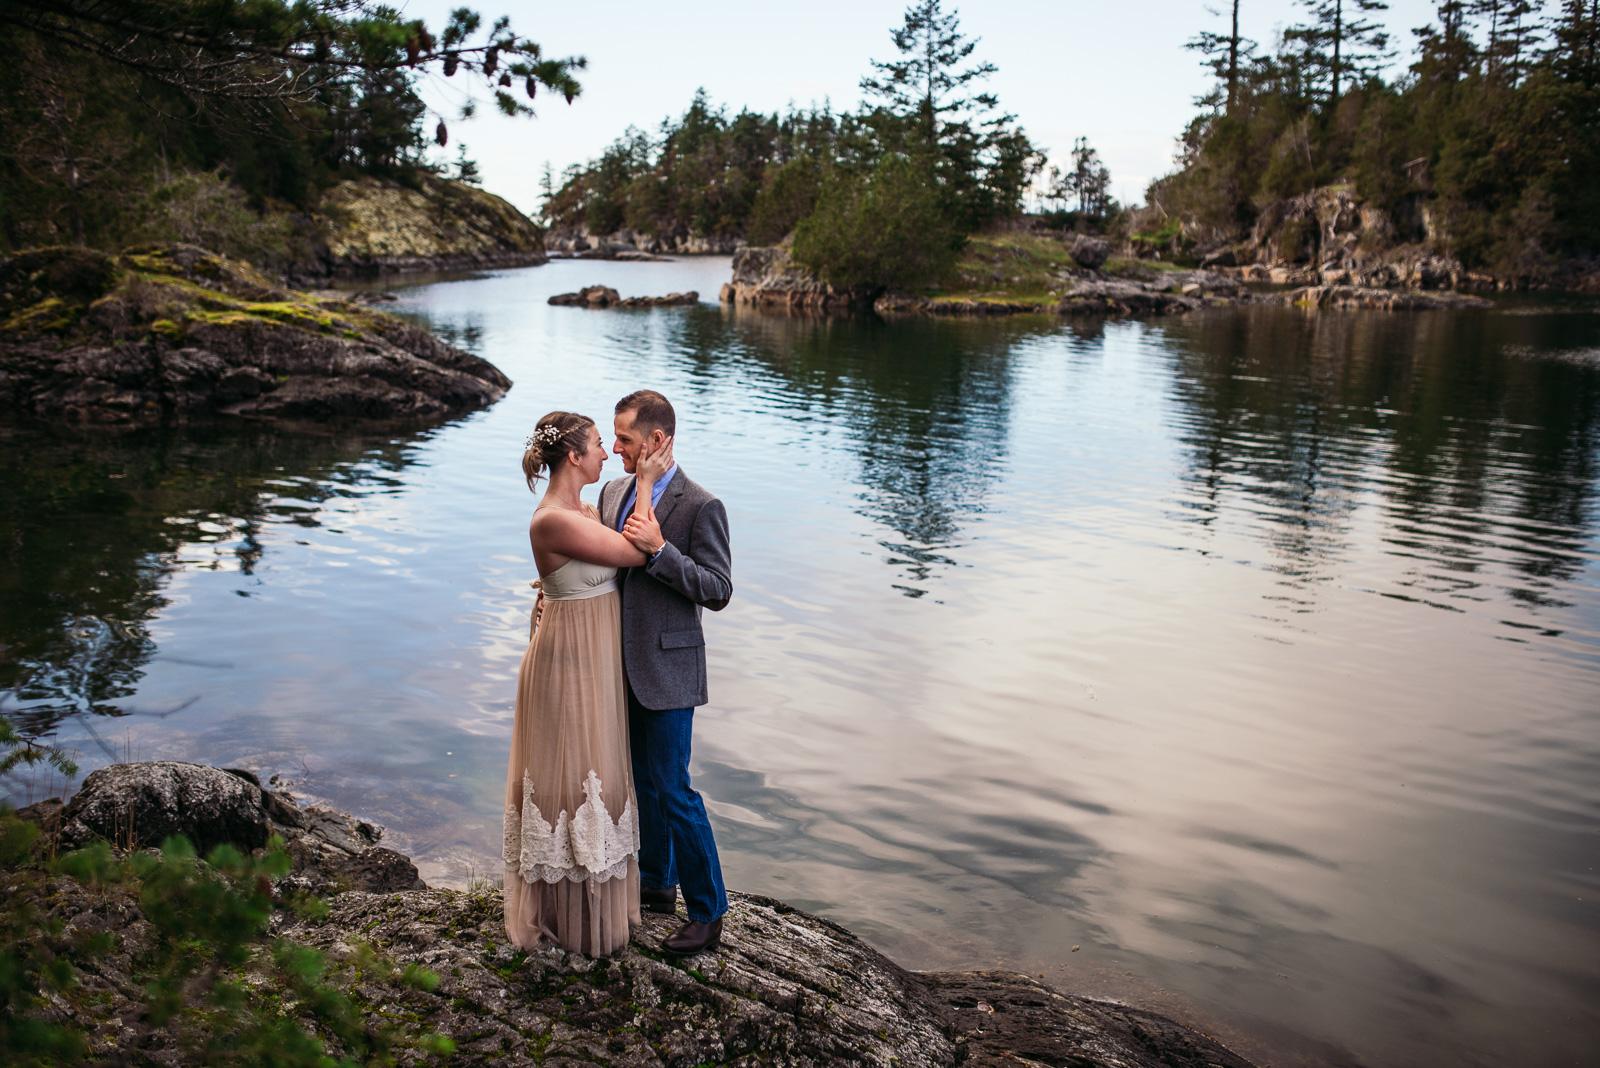 vancouver-island-wedding-photographers-cliff-gilker-park-smugglers-cove-elopement-30.jpg